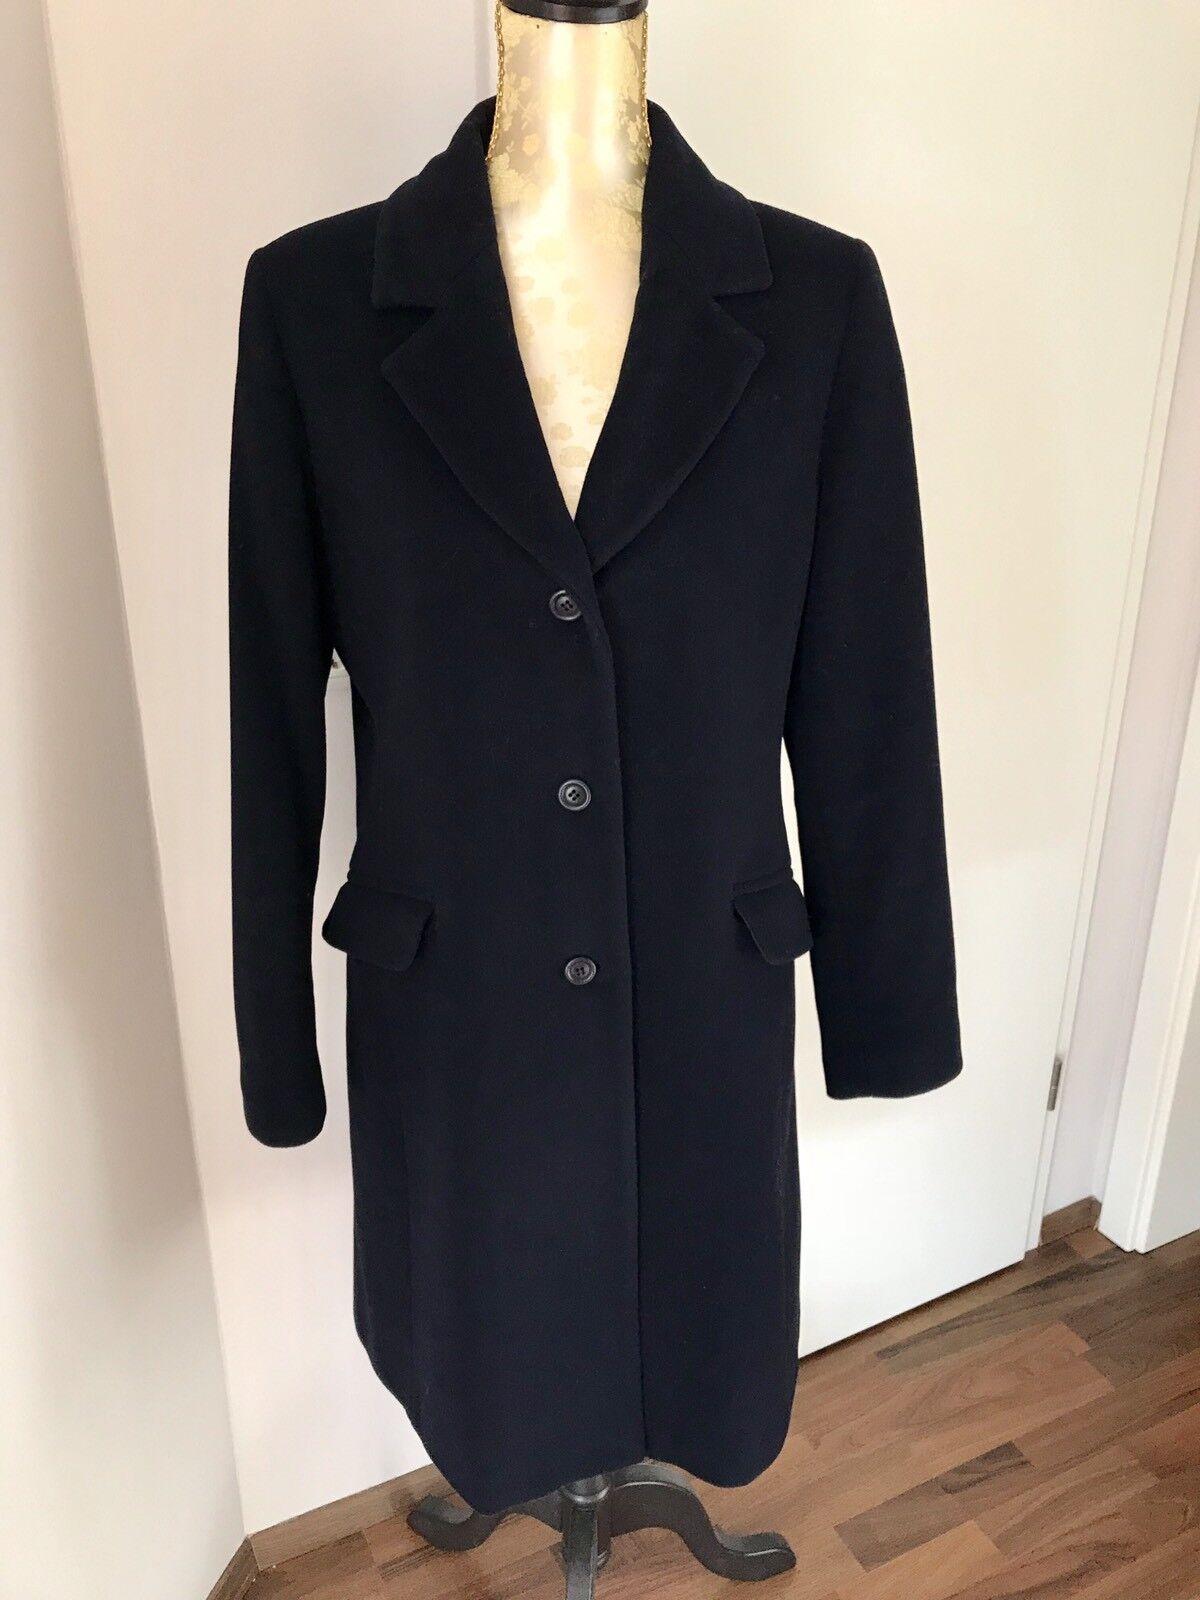 Oscuro abrigo azul   Best Connection  talla 42  Neuw  lana virgen & cachemira  tienda